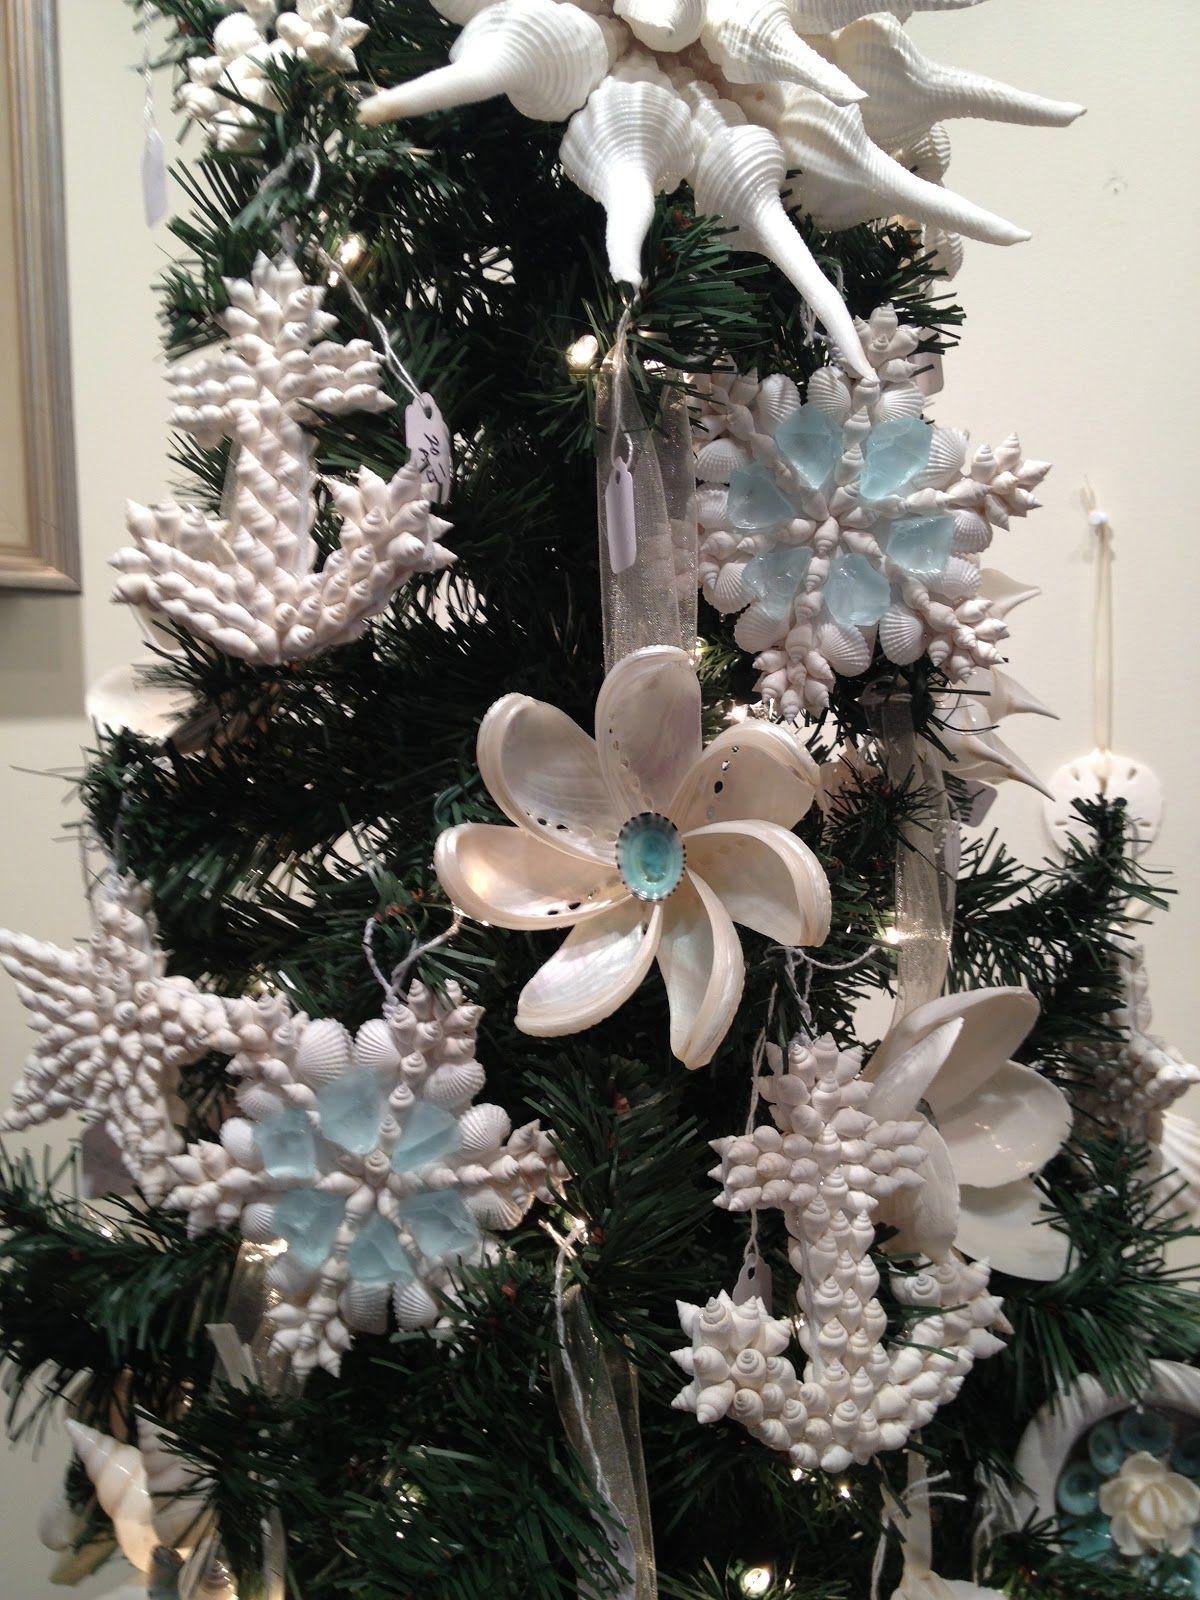 Fine Shell Art Blog Shells Shell Art Other Coastal Delights Seashell Christmas Ornaments Seashell Crafts Shell Crafts